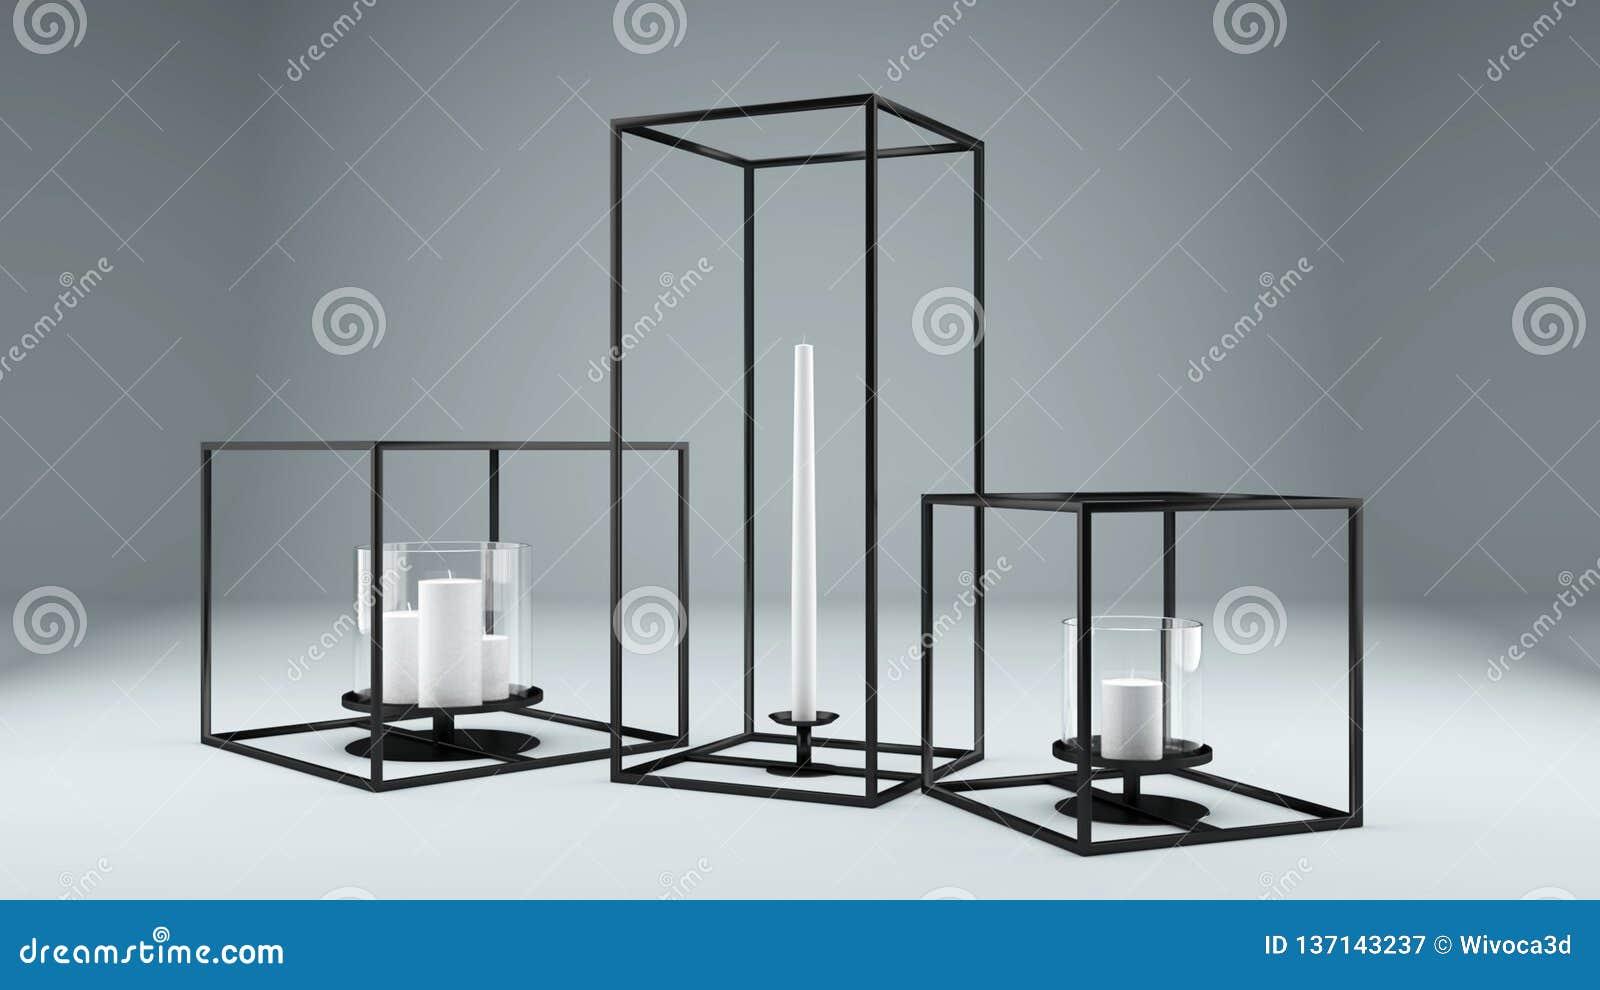 Picture of: Modern Rectangular Metal Framed Candle Holder Stock Illustration Illustration Of Rectangular Candle 137143237